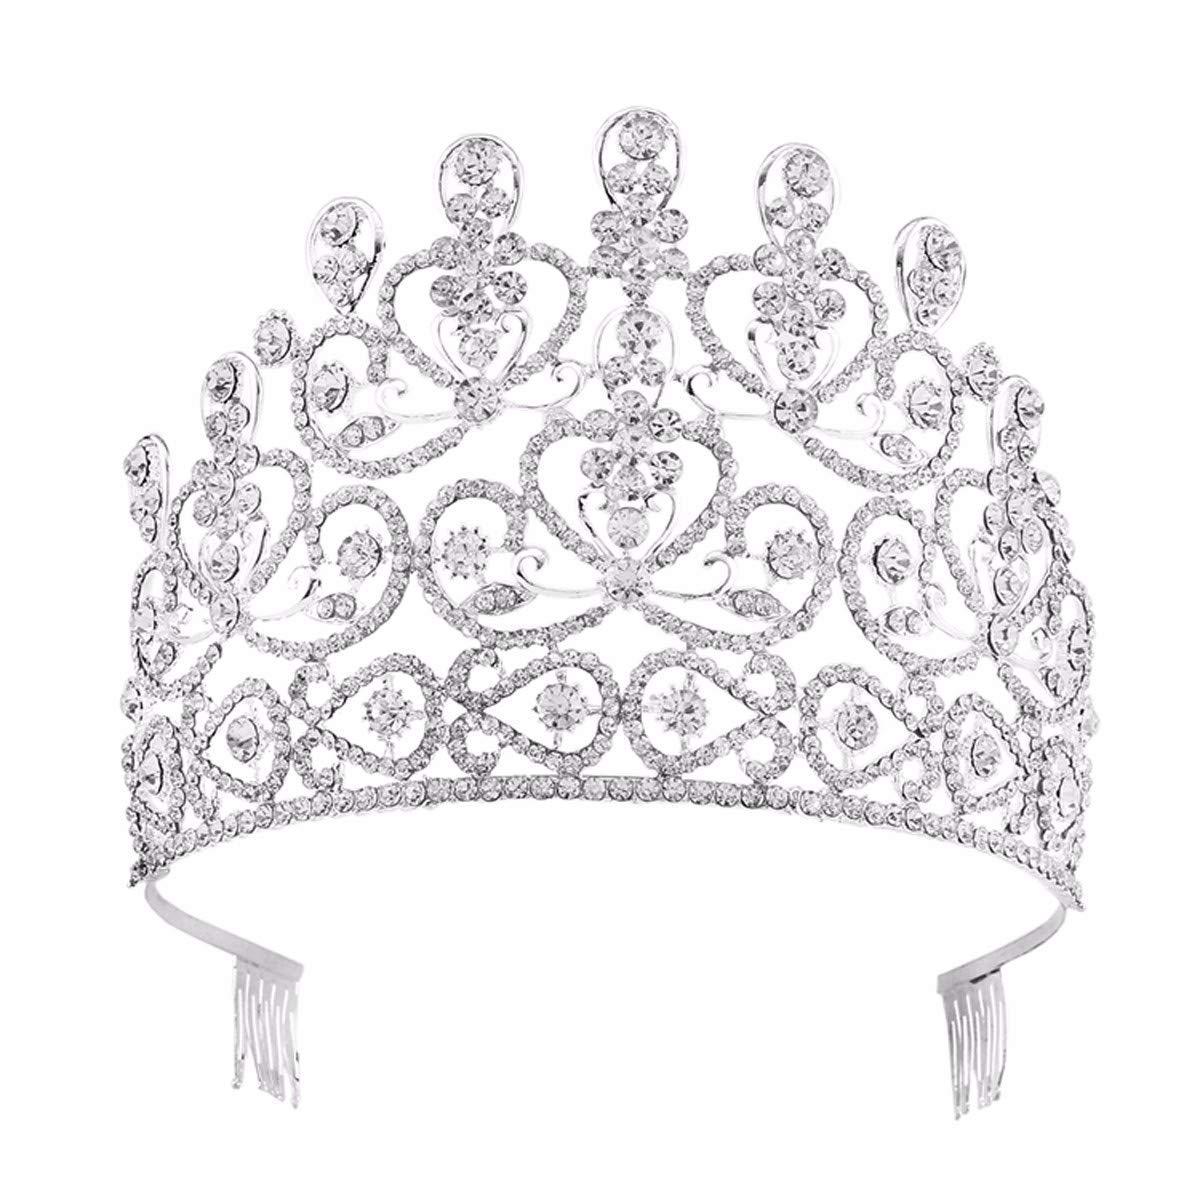 Girls Crown, Beautiful headdress/Top Ornaments Bridal Crown Hair Ornaments Wedding Accessories Diamond Headwear Wedding Gowns And Accessories.